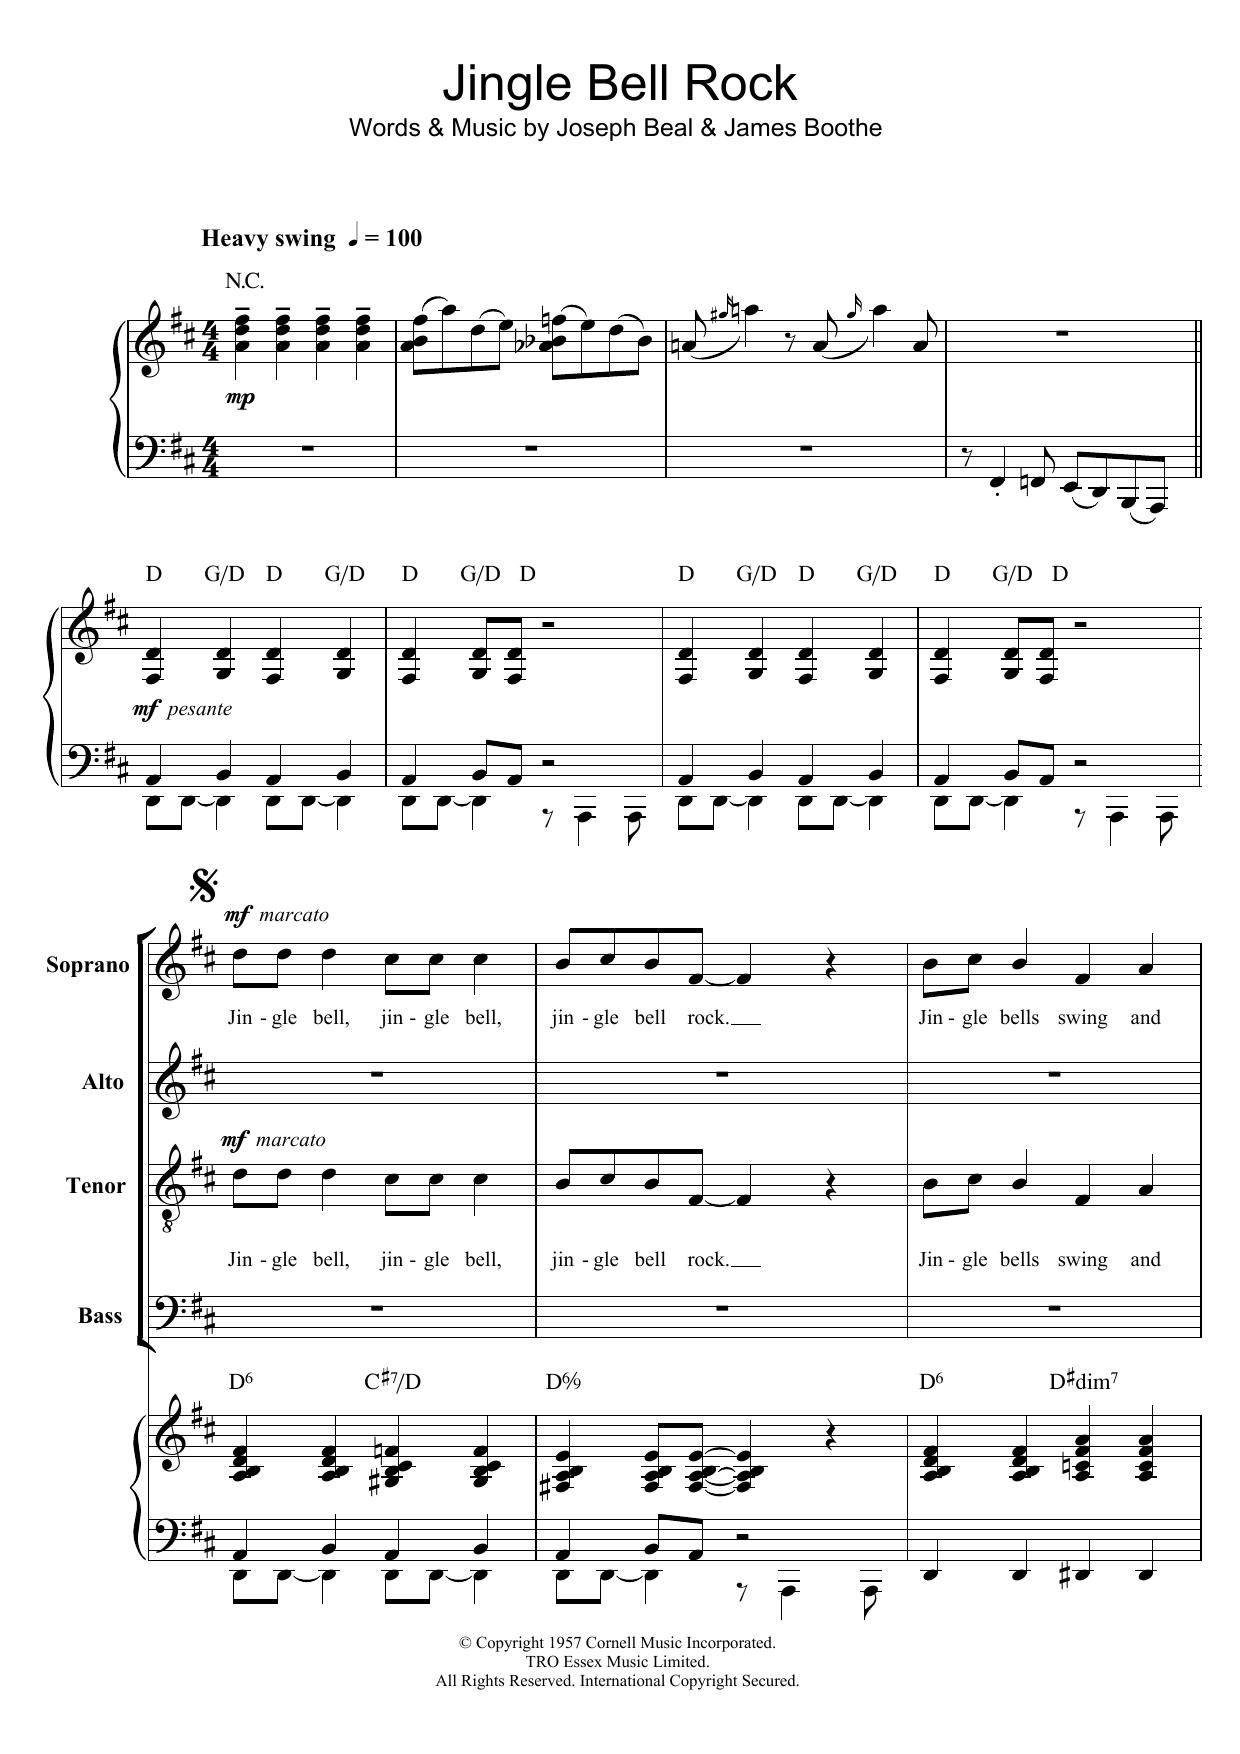 Jingle Bell Rock (arr. Berty Rice) Sheet Music